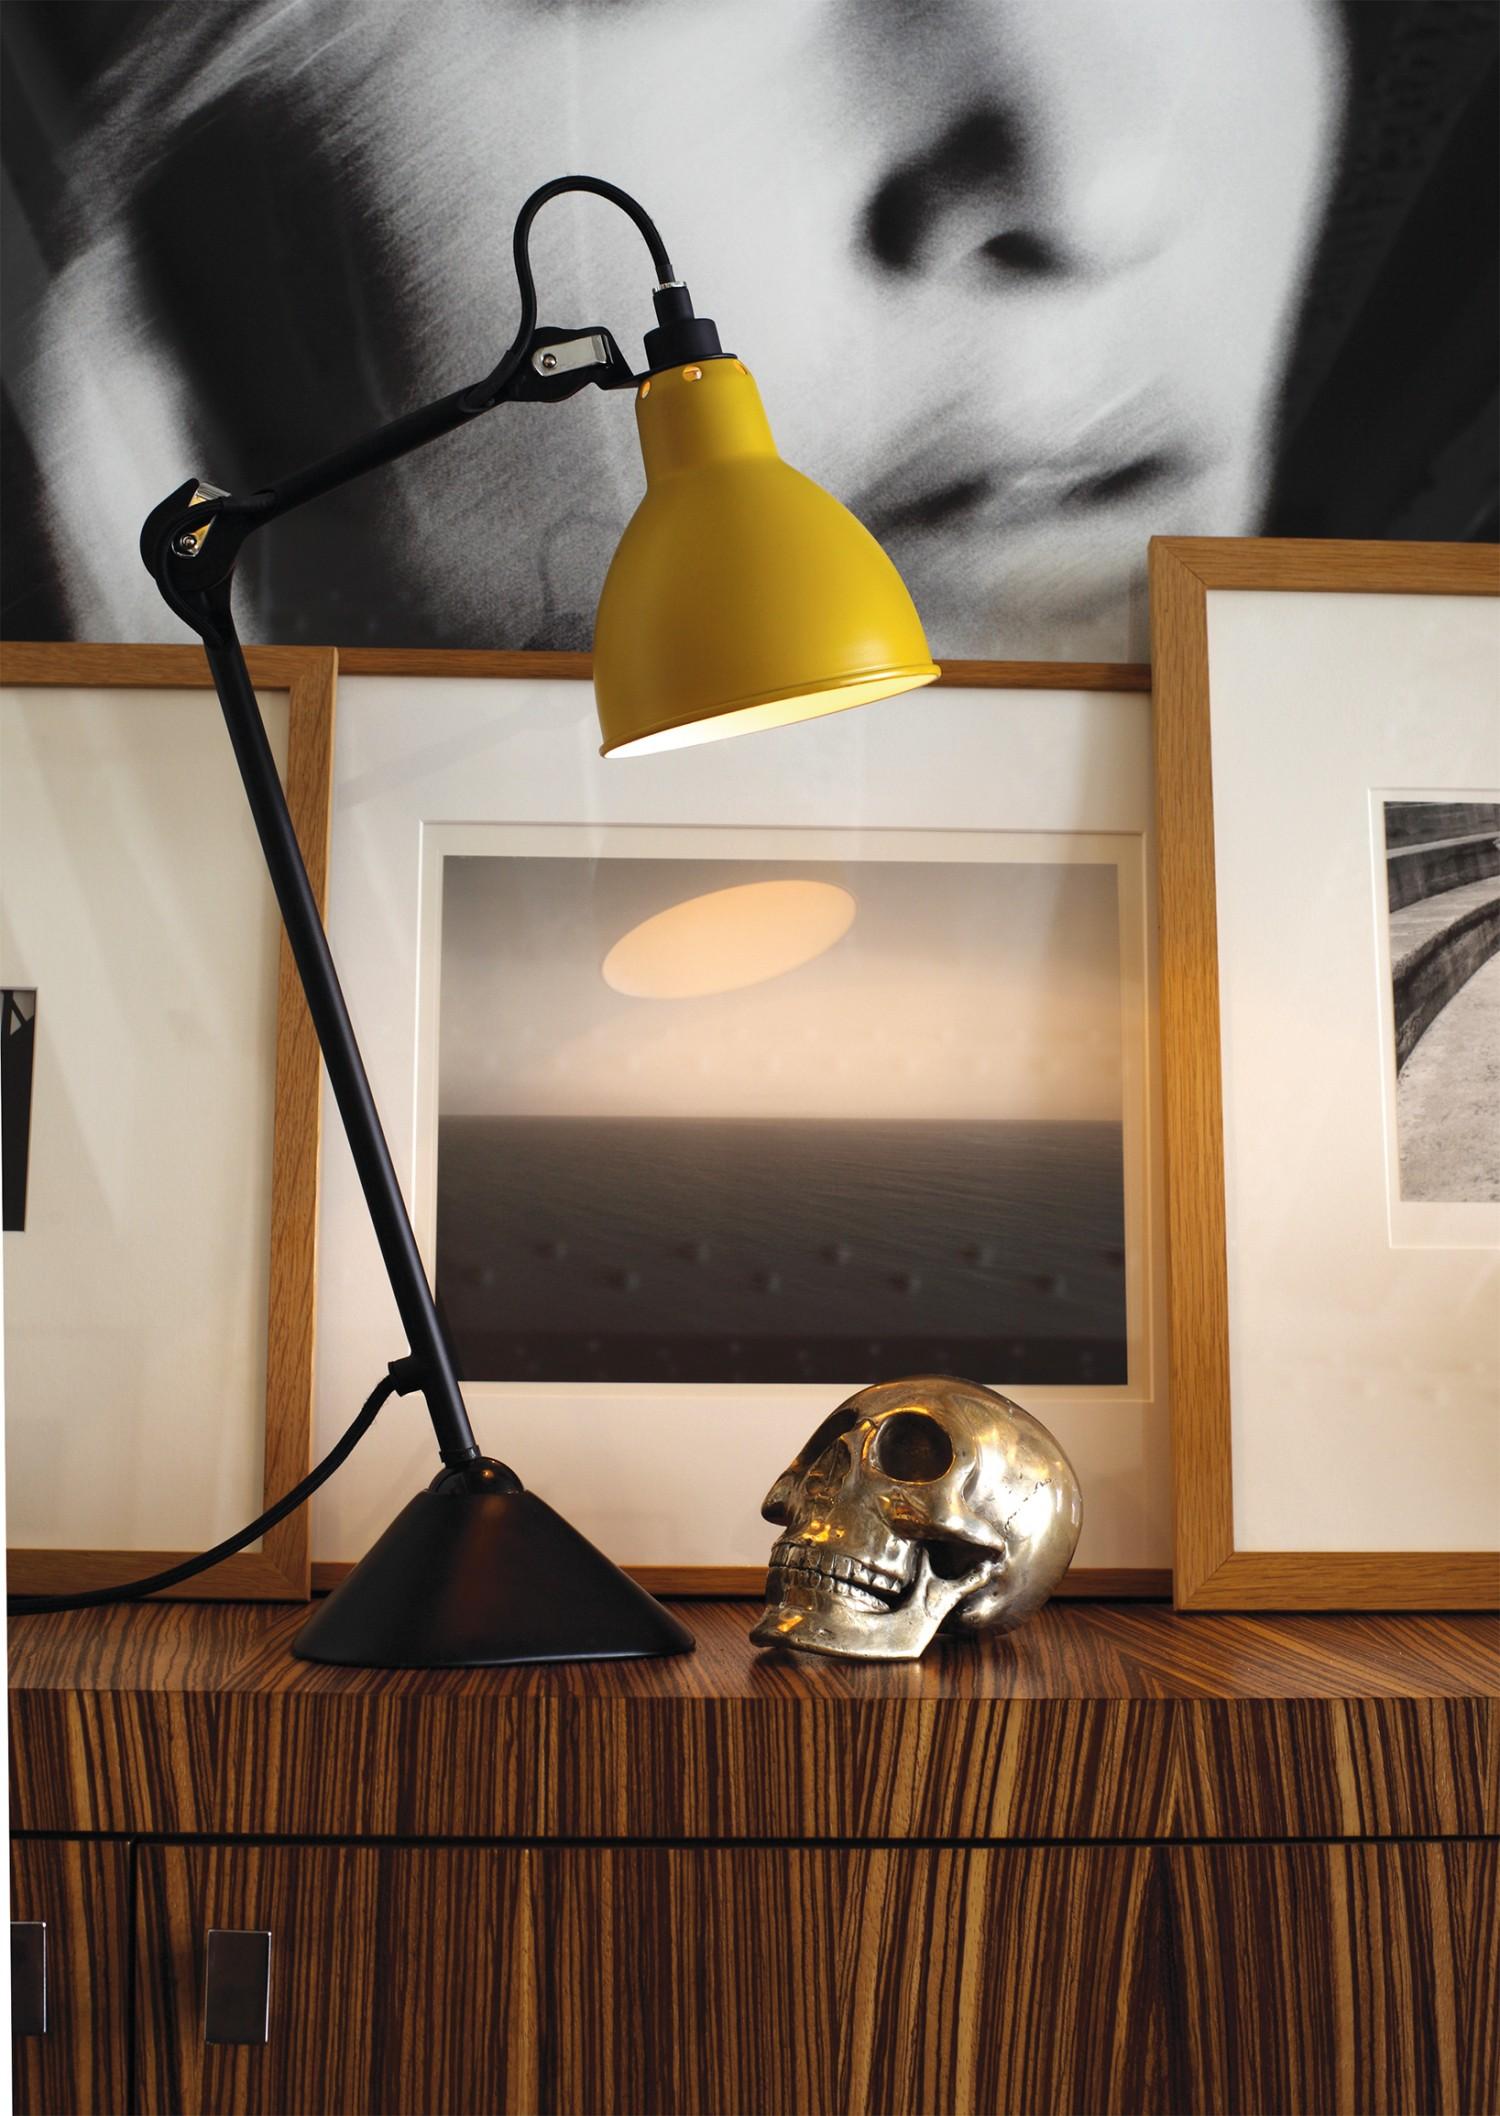 LAMPE GRAS N°205 Lampe à poser